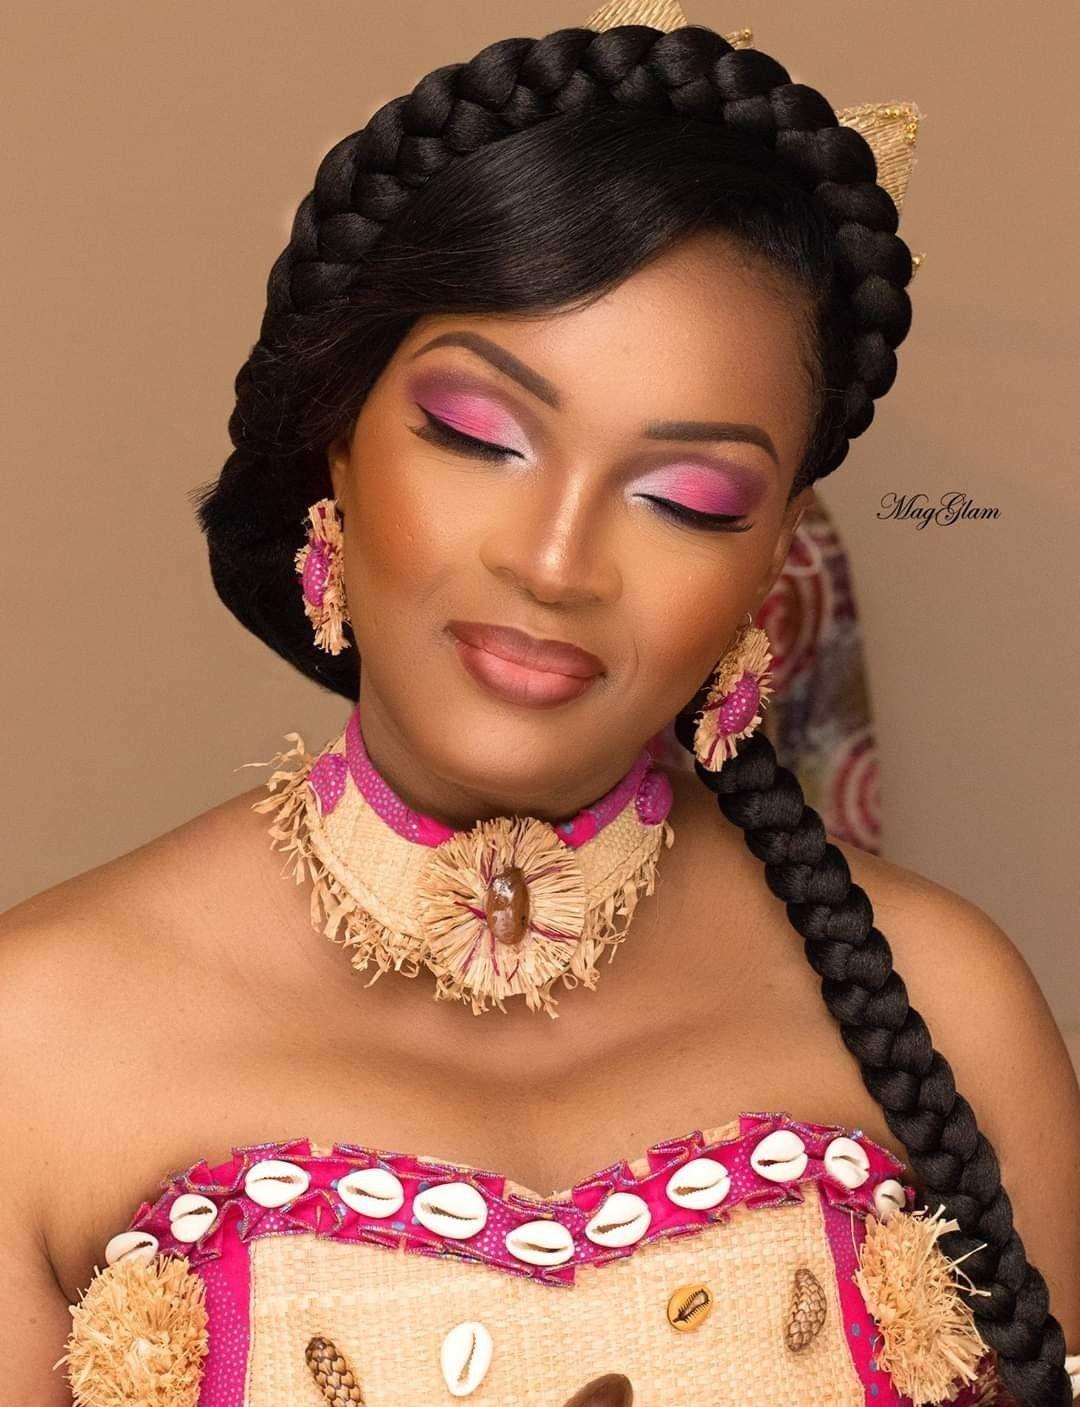 Tresses Africaines Coiffure De Mariage Mariage Personnalise Gabon Gabon Mariage Cheveux De M African Wedding Hairstyles Amazing Wedding Makeup Coiffure Mariage